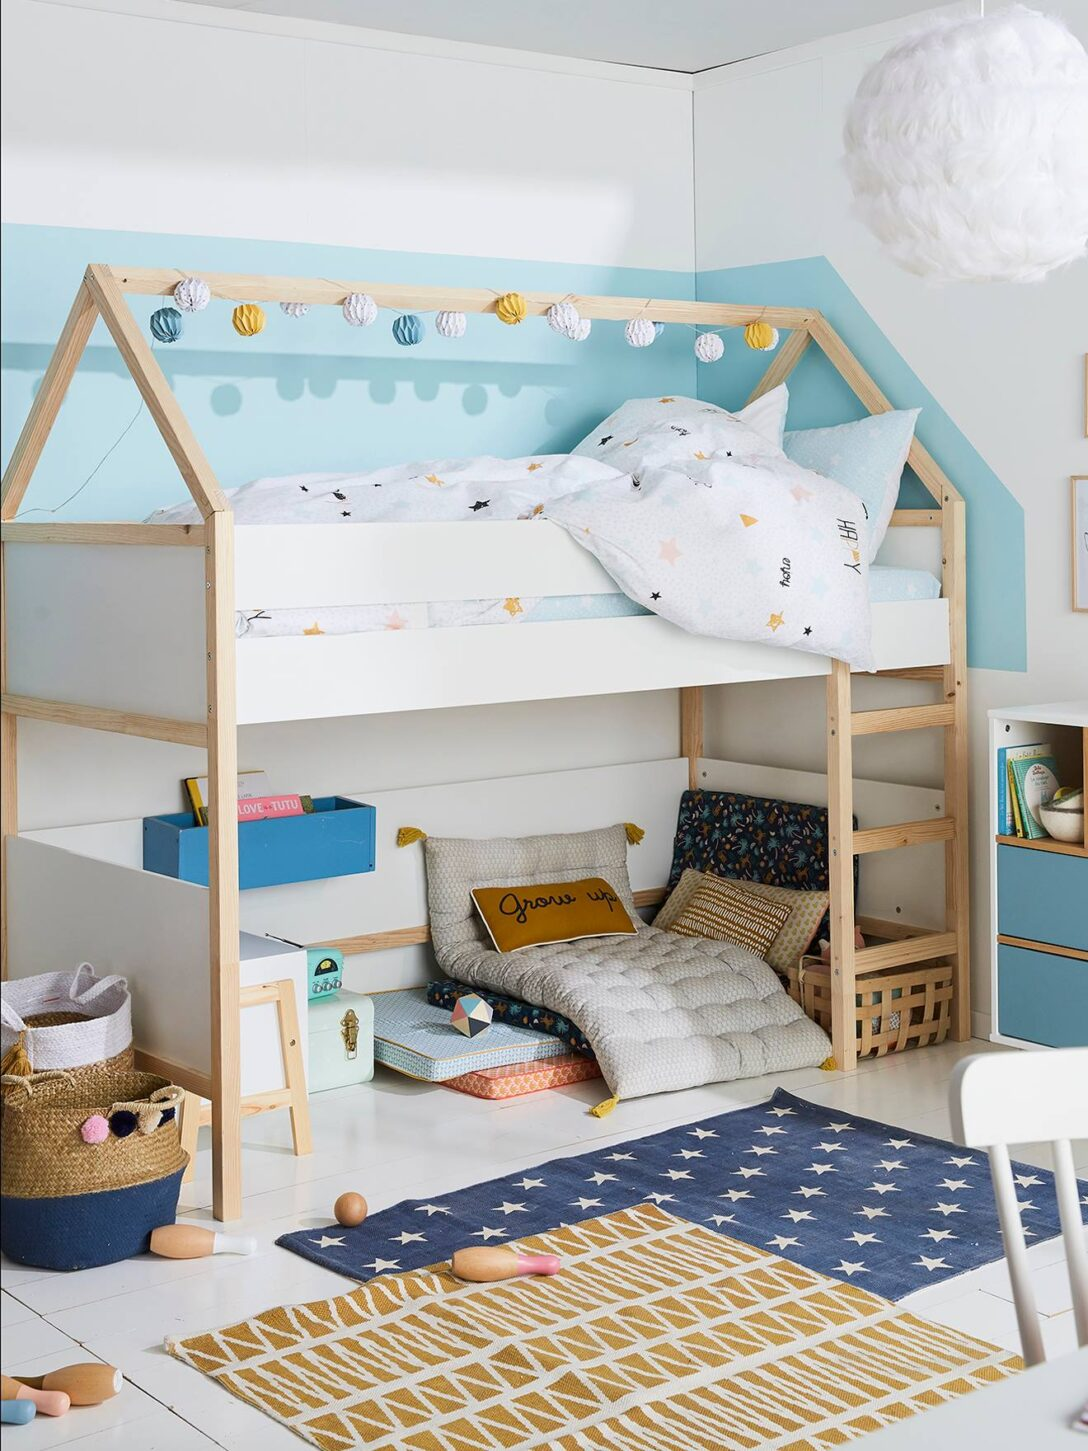 Large Size of Vertbaudet Hochbett Regal Kinderzimmer Sofa Weiß Regale Kinderzimmer Kinderzimmer Hochbett